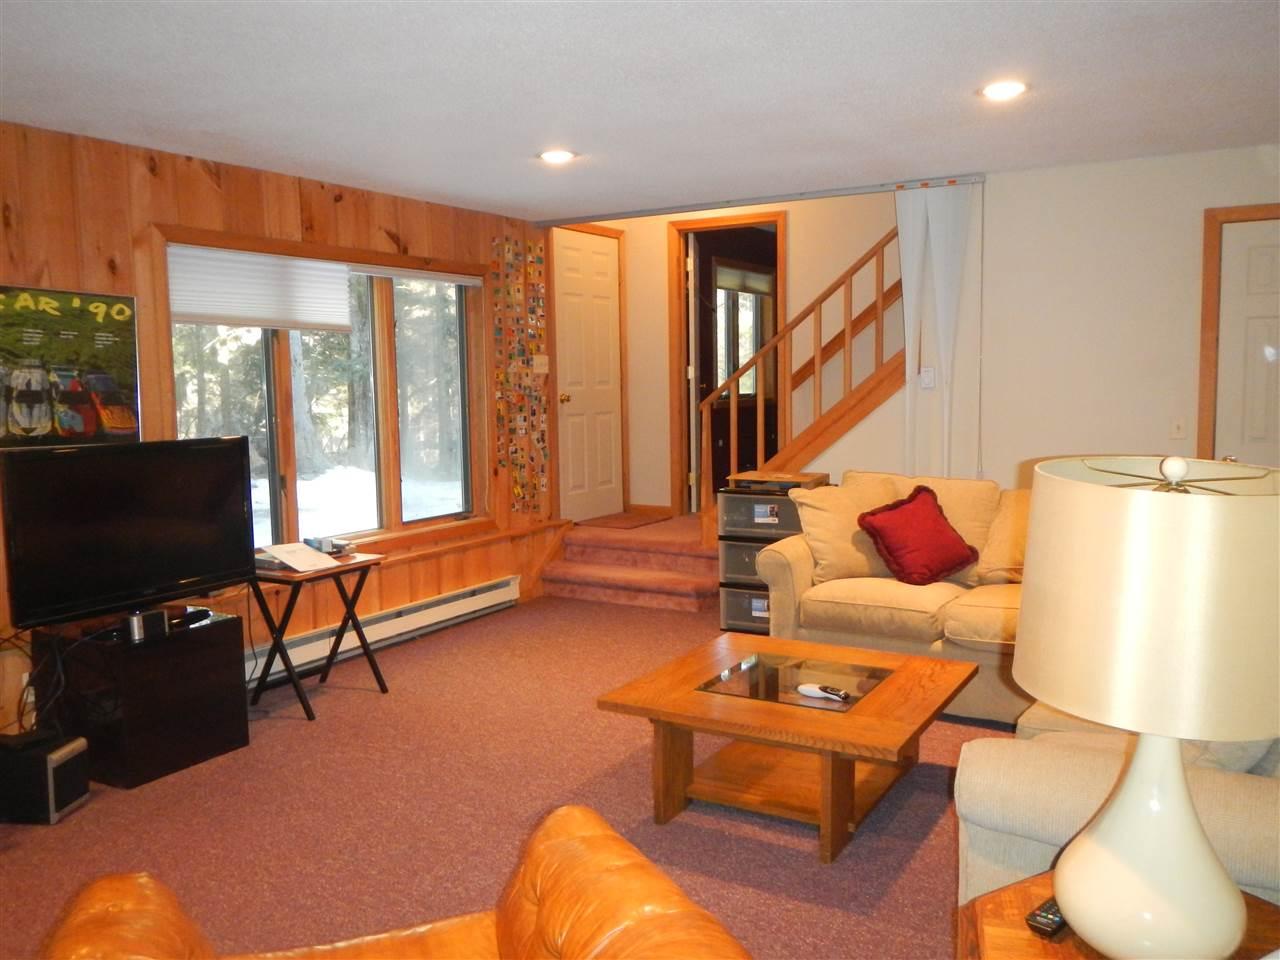 Mount-Snow-Real-Estate-4614310-7